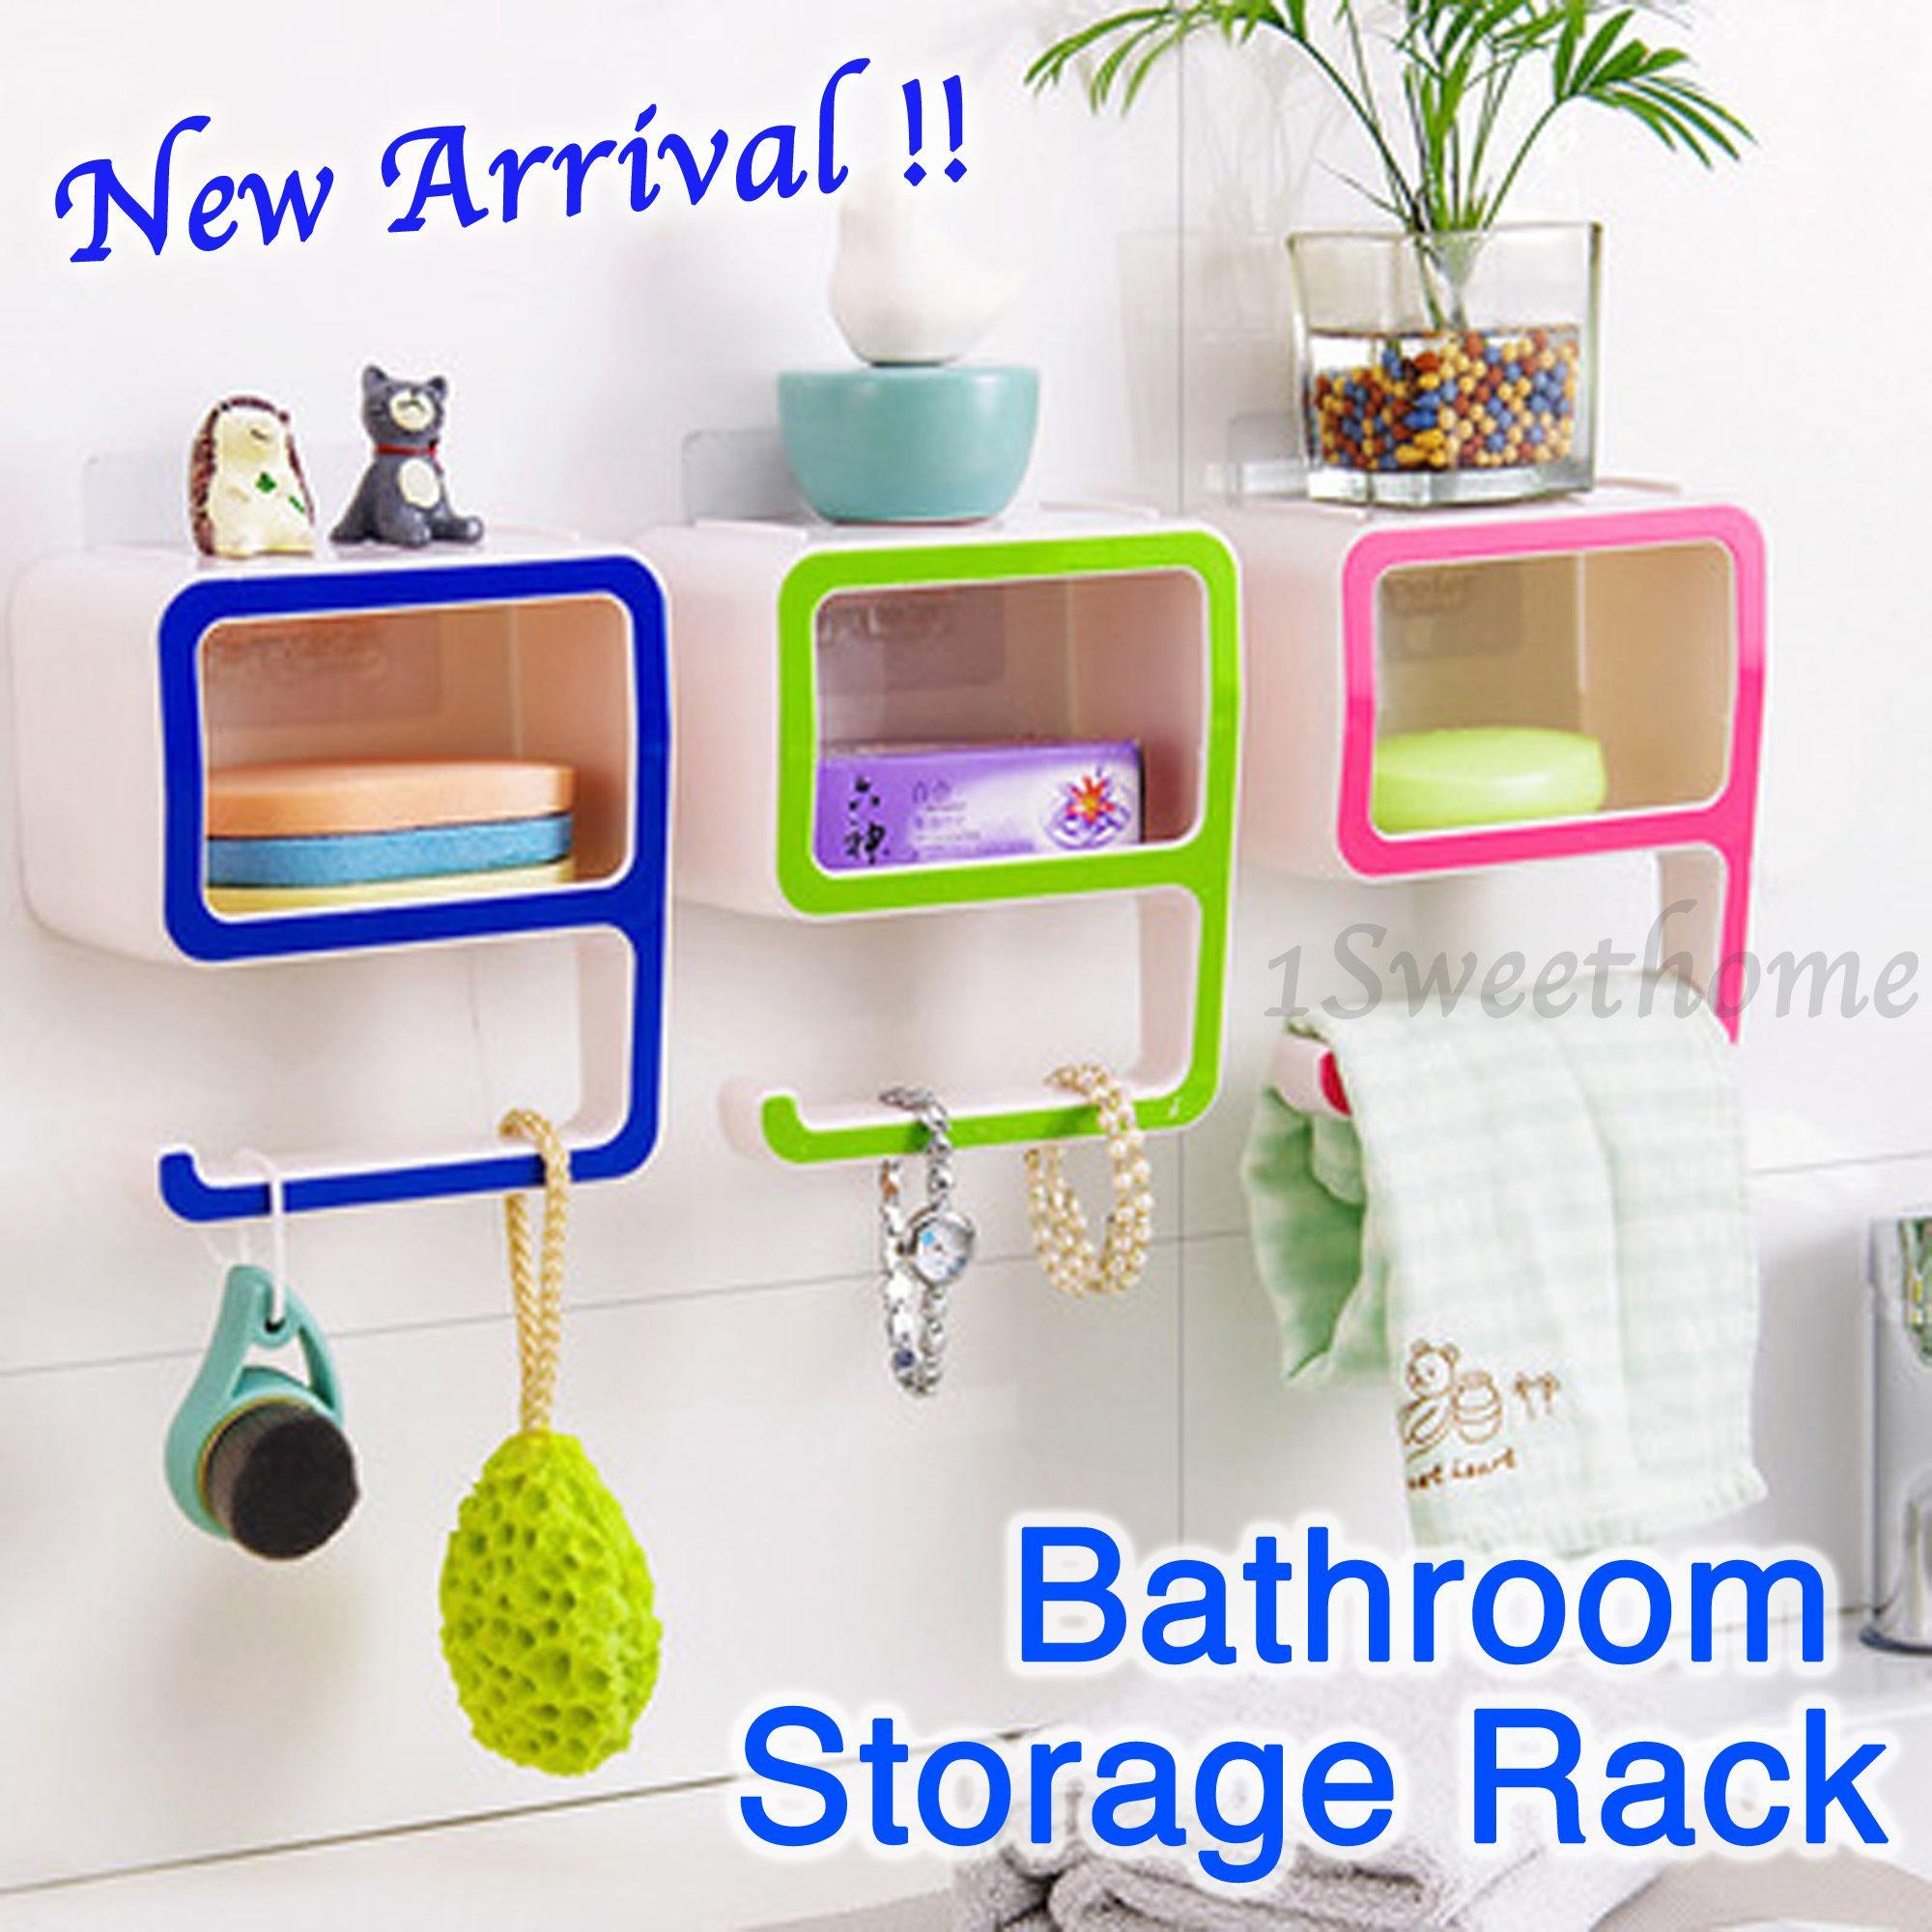 990▽61%☆Bathroom Storage Rack☆Bathroom Accessories Storage Adorable Bathroom Storage Containers Review